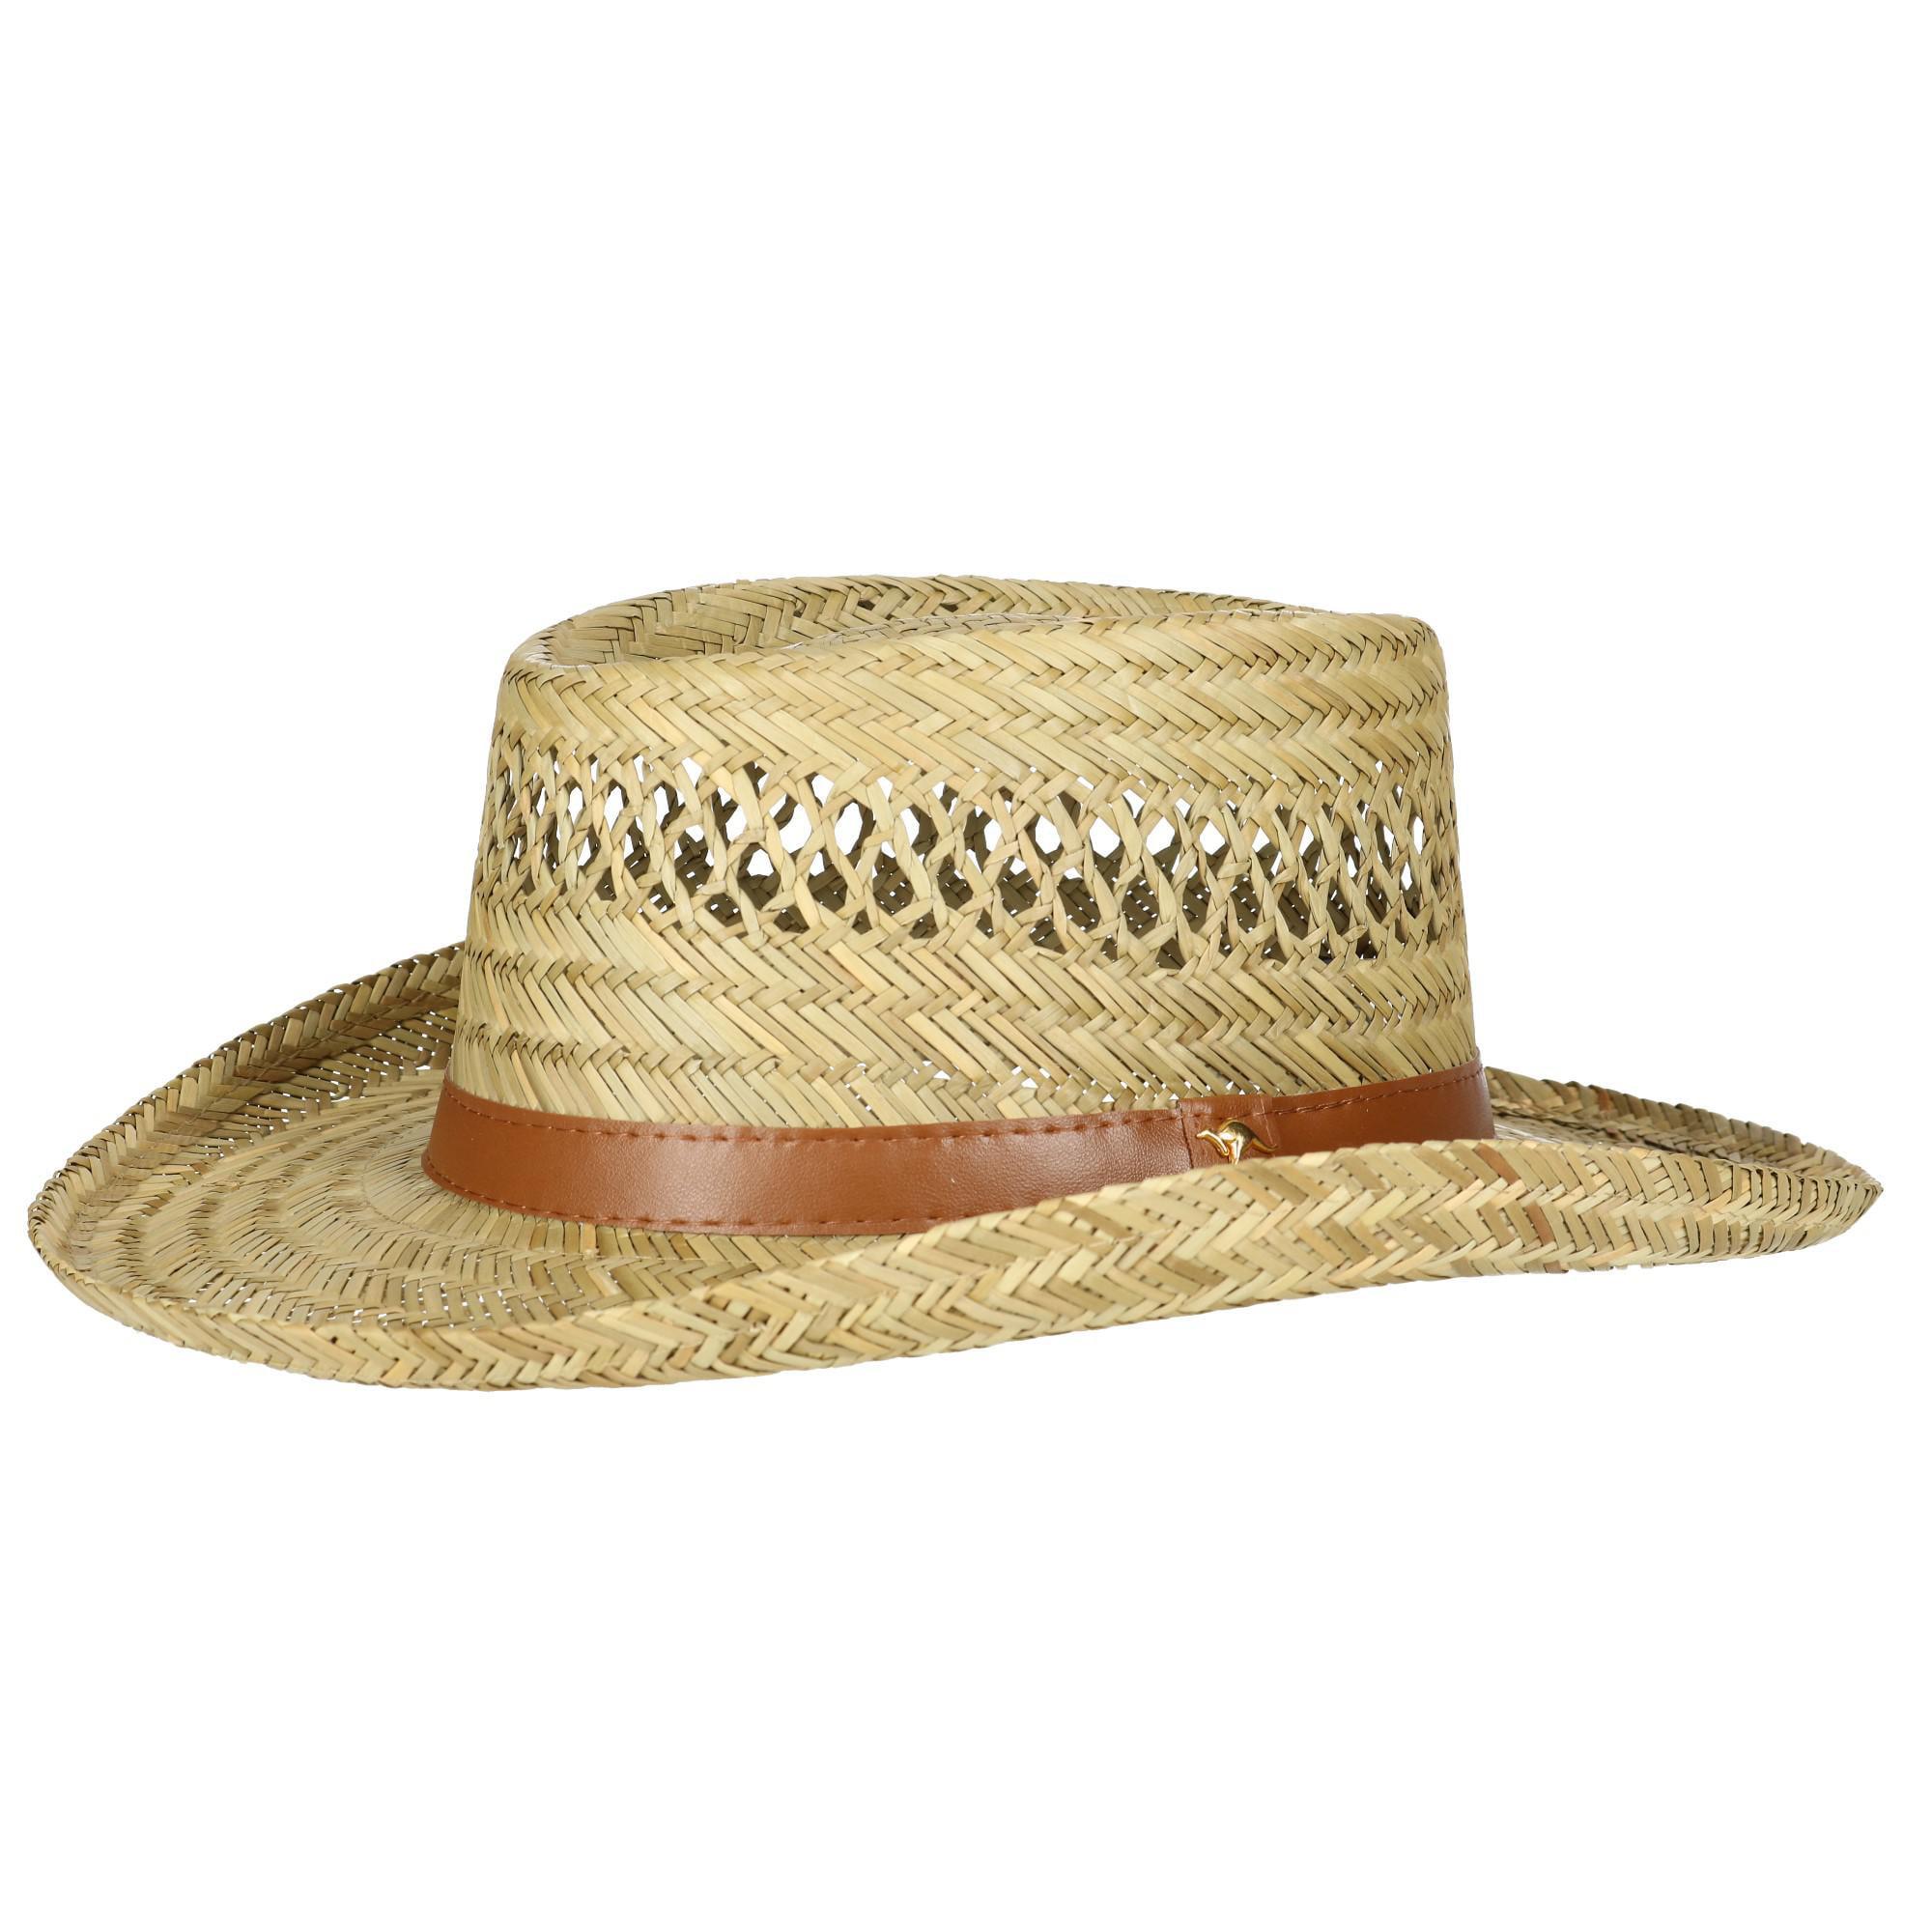 e6981ec93fa9a Dorfman Pacific Rush Straw Lightweight Gambler Hat with Wide Brim ...